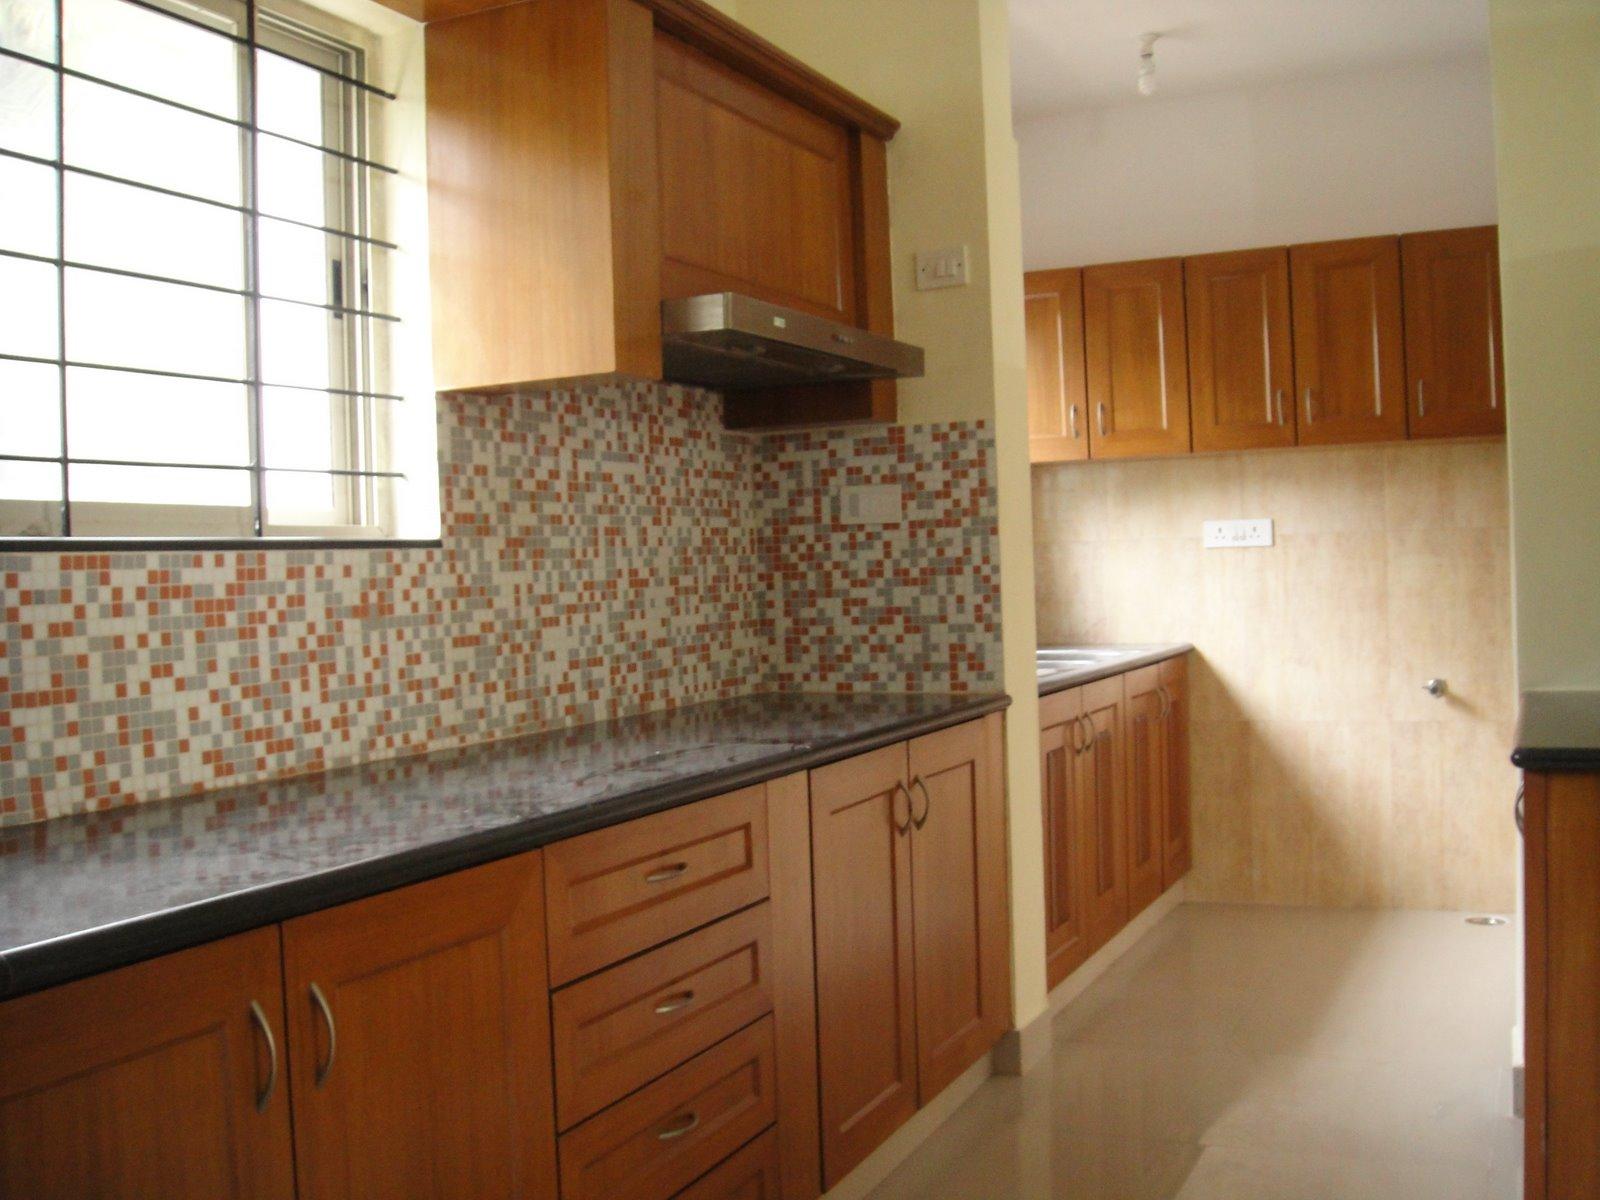 Chippendale bangalore kitchen cabinet mr ravi for Kitchen cabinets bangalore